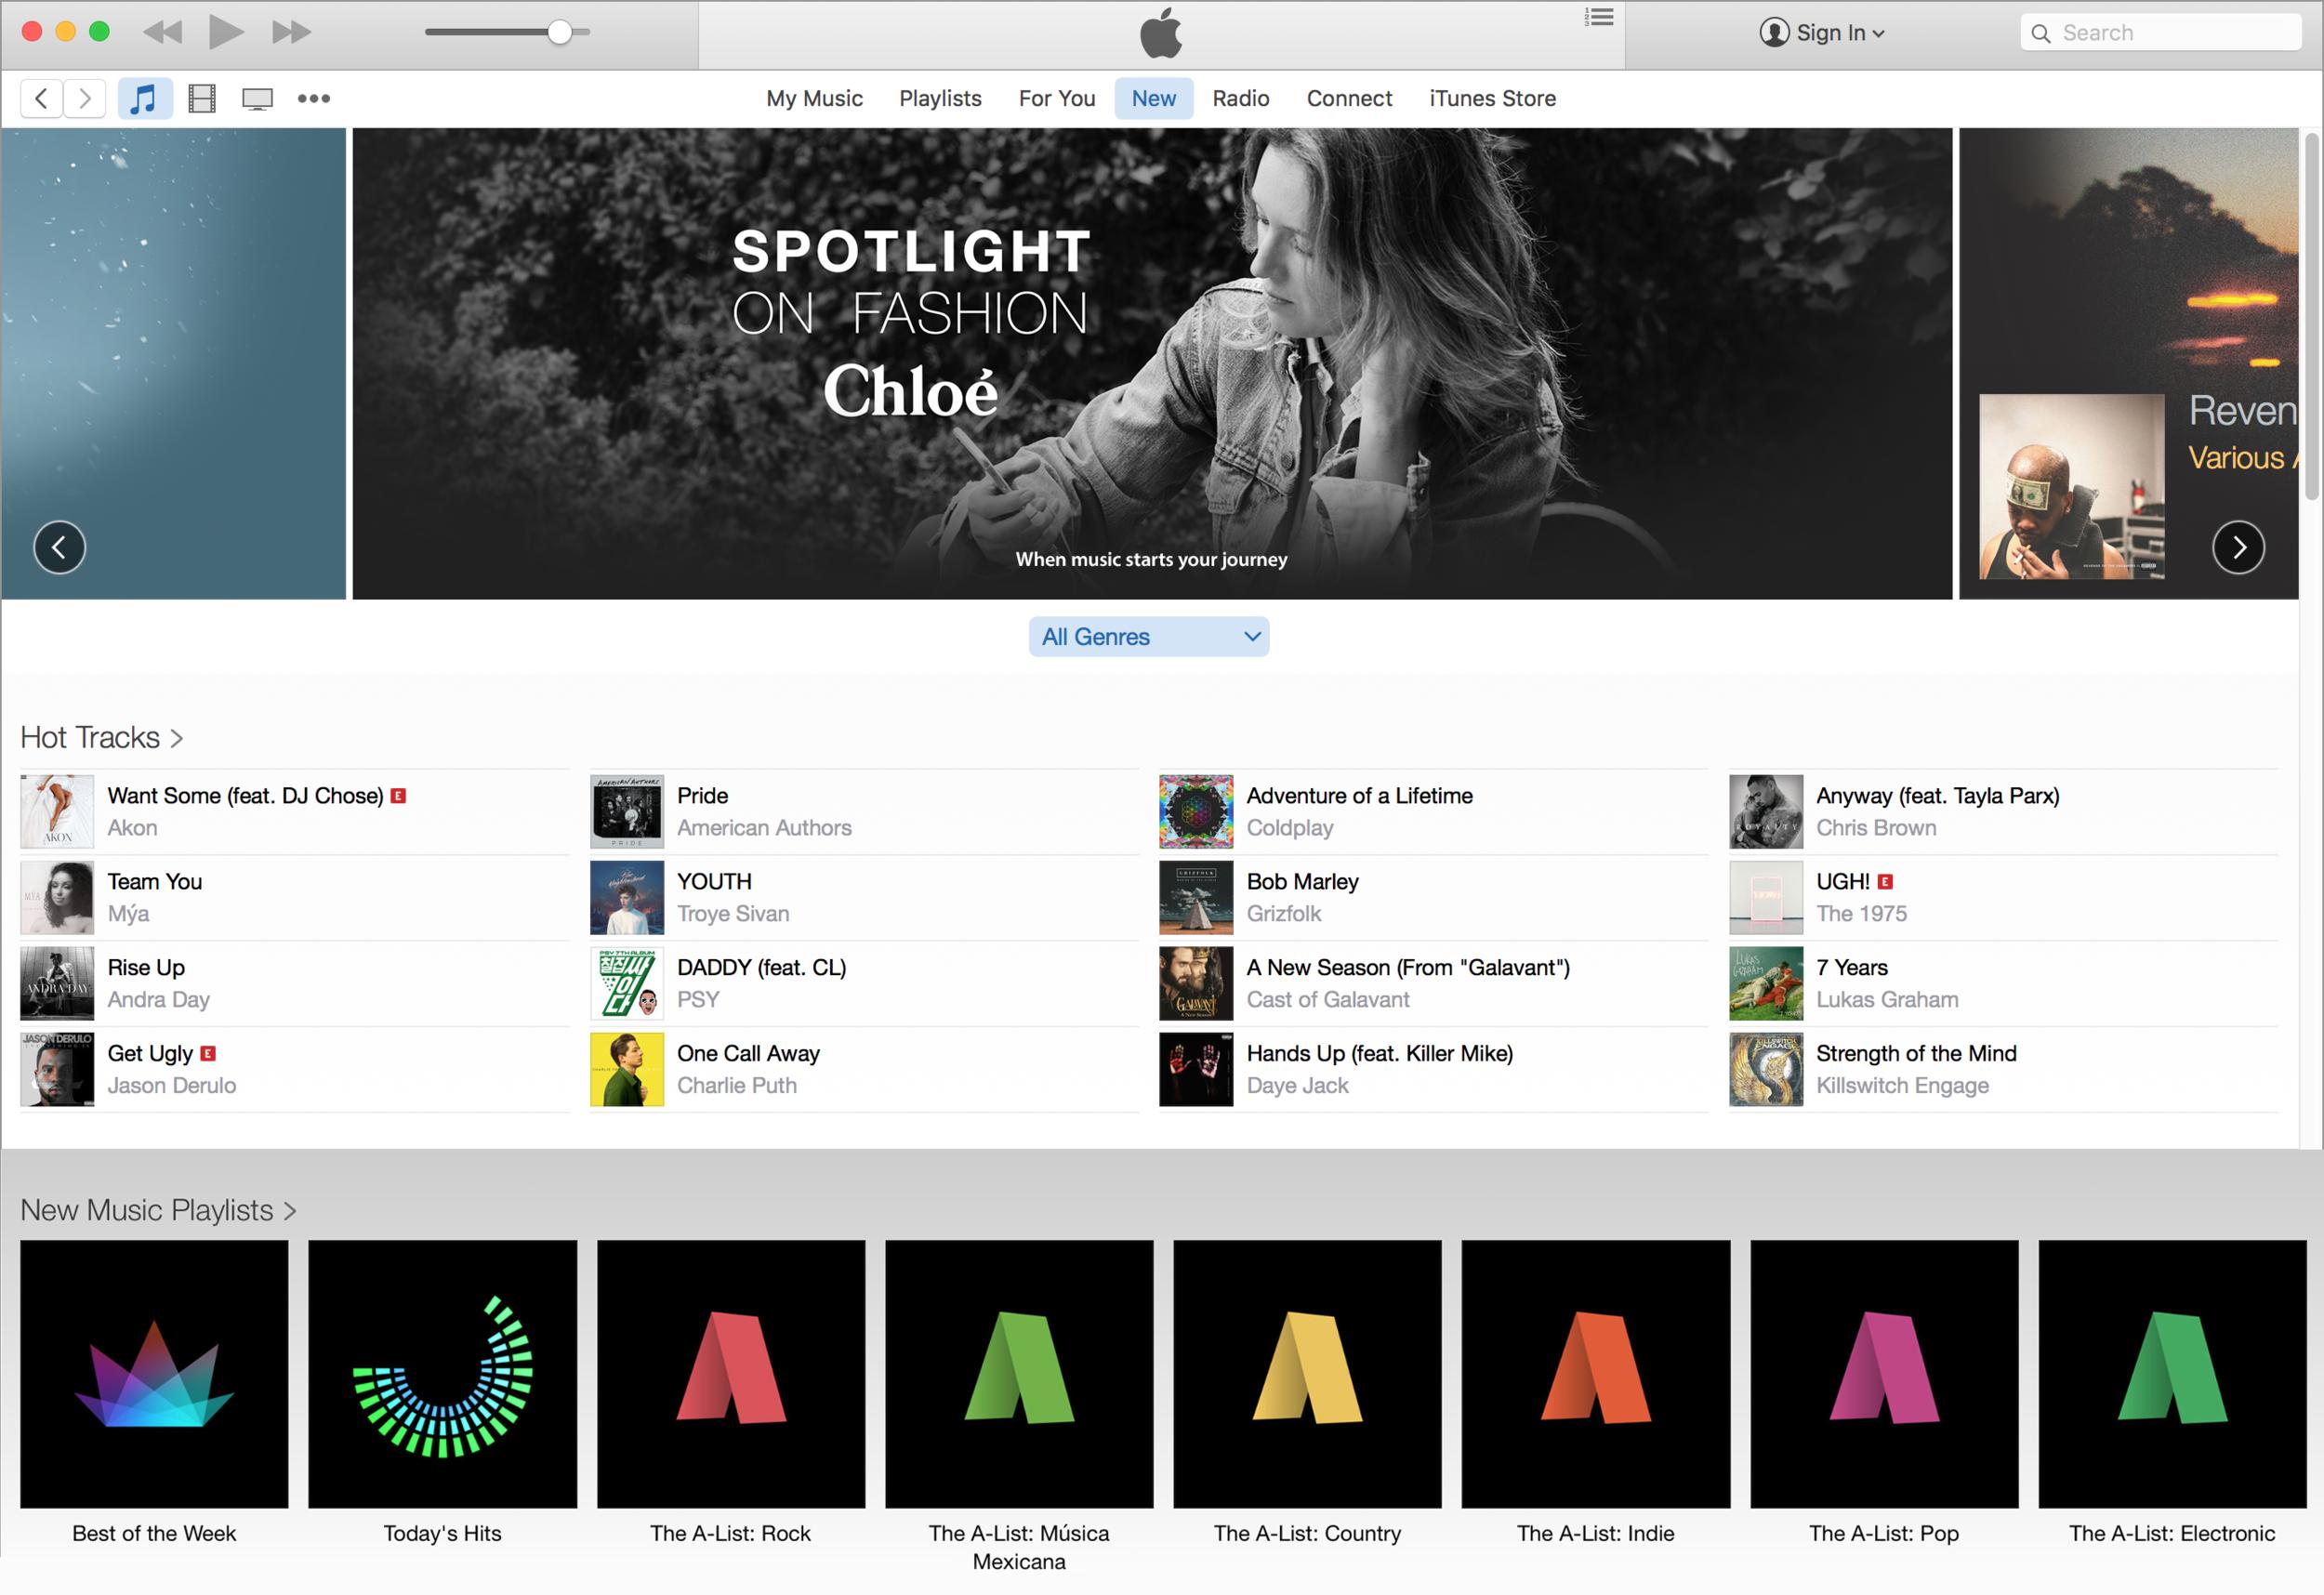 Chloé - Store-art on Apple Music